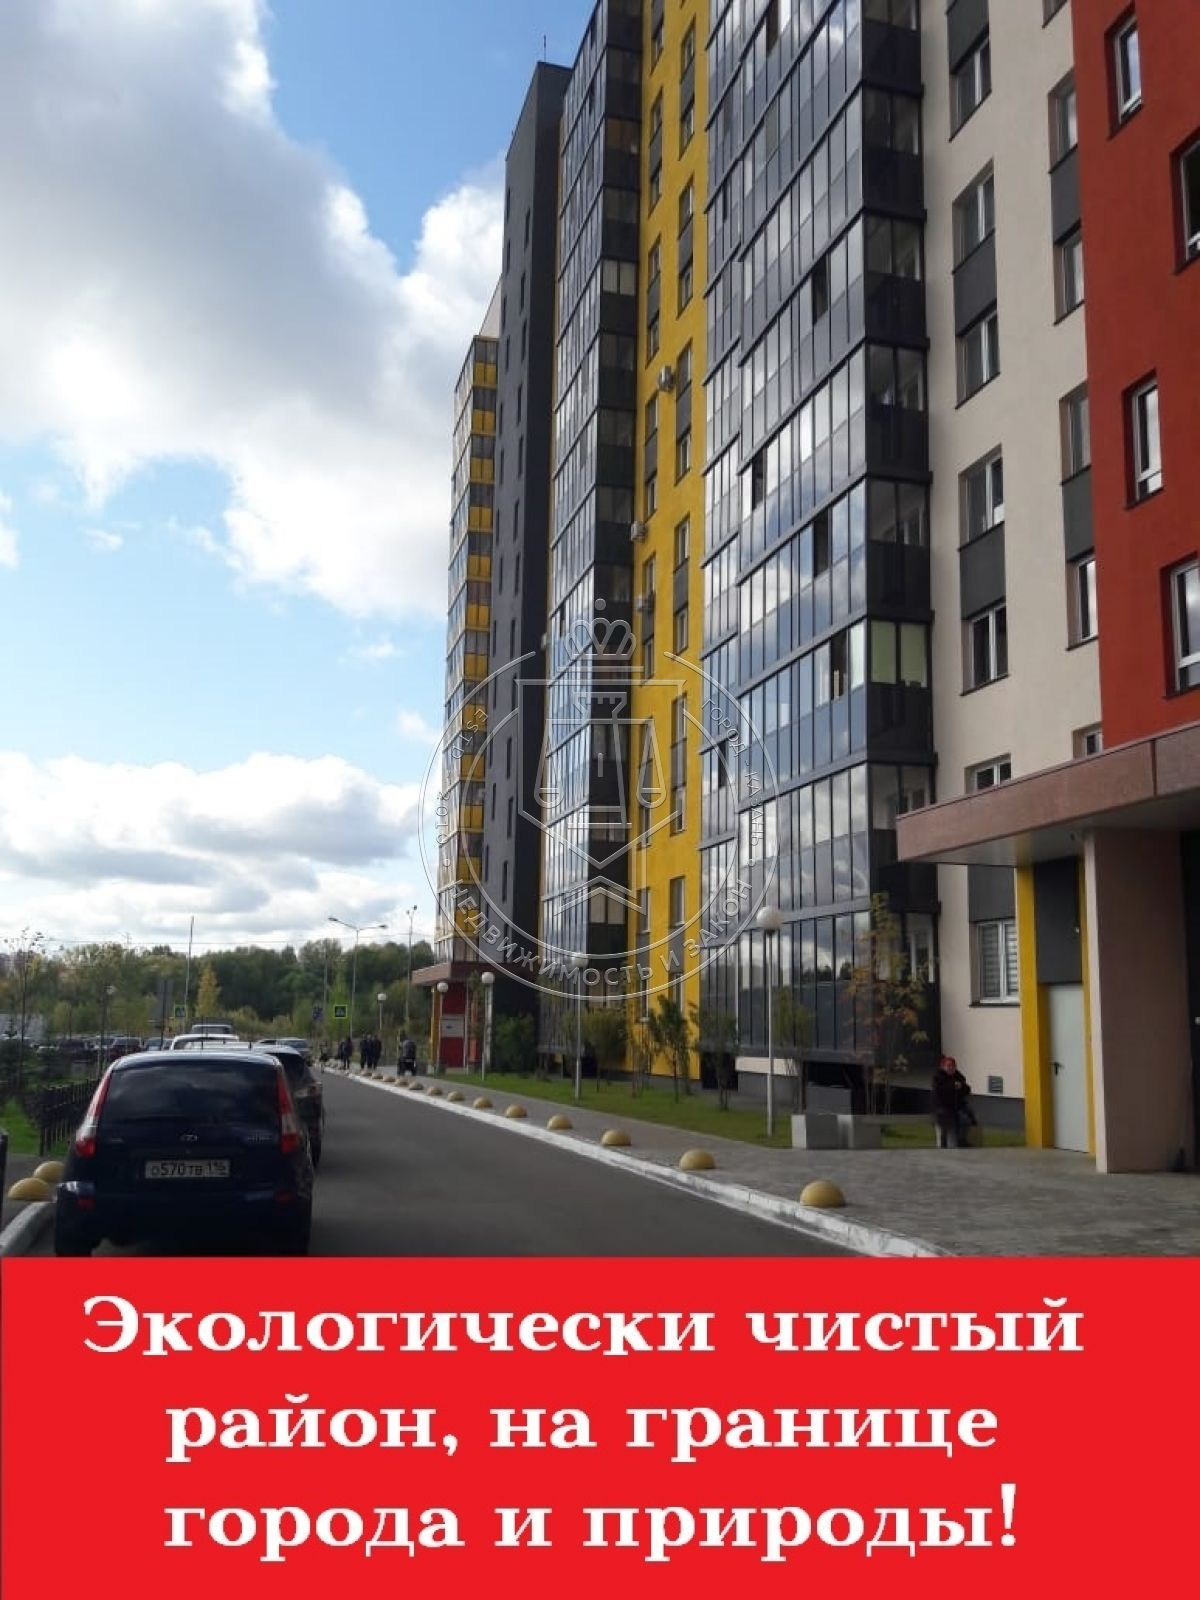 Продажа 2-к квартиры Натана Рахлина ул, 1-14